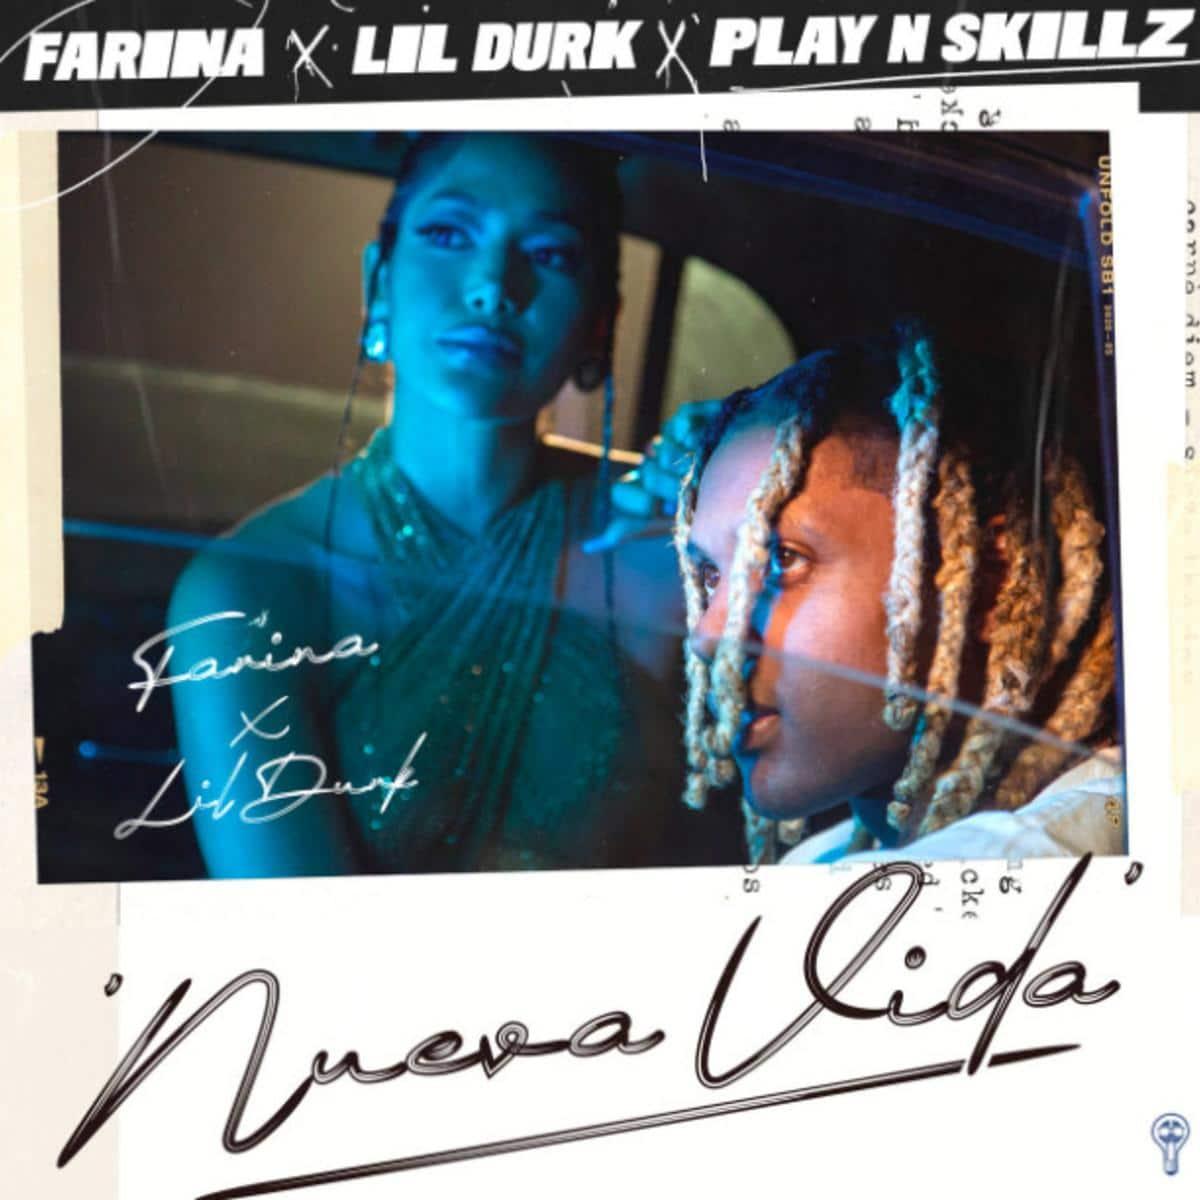 Farina Ft. Lil Durk & Play-N-Skillz - Nueva Vida Mp3